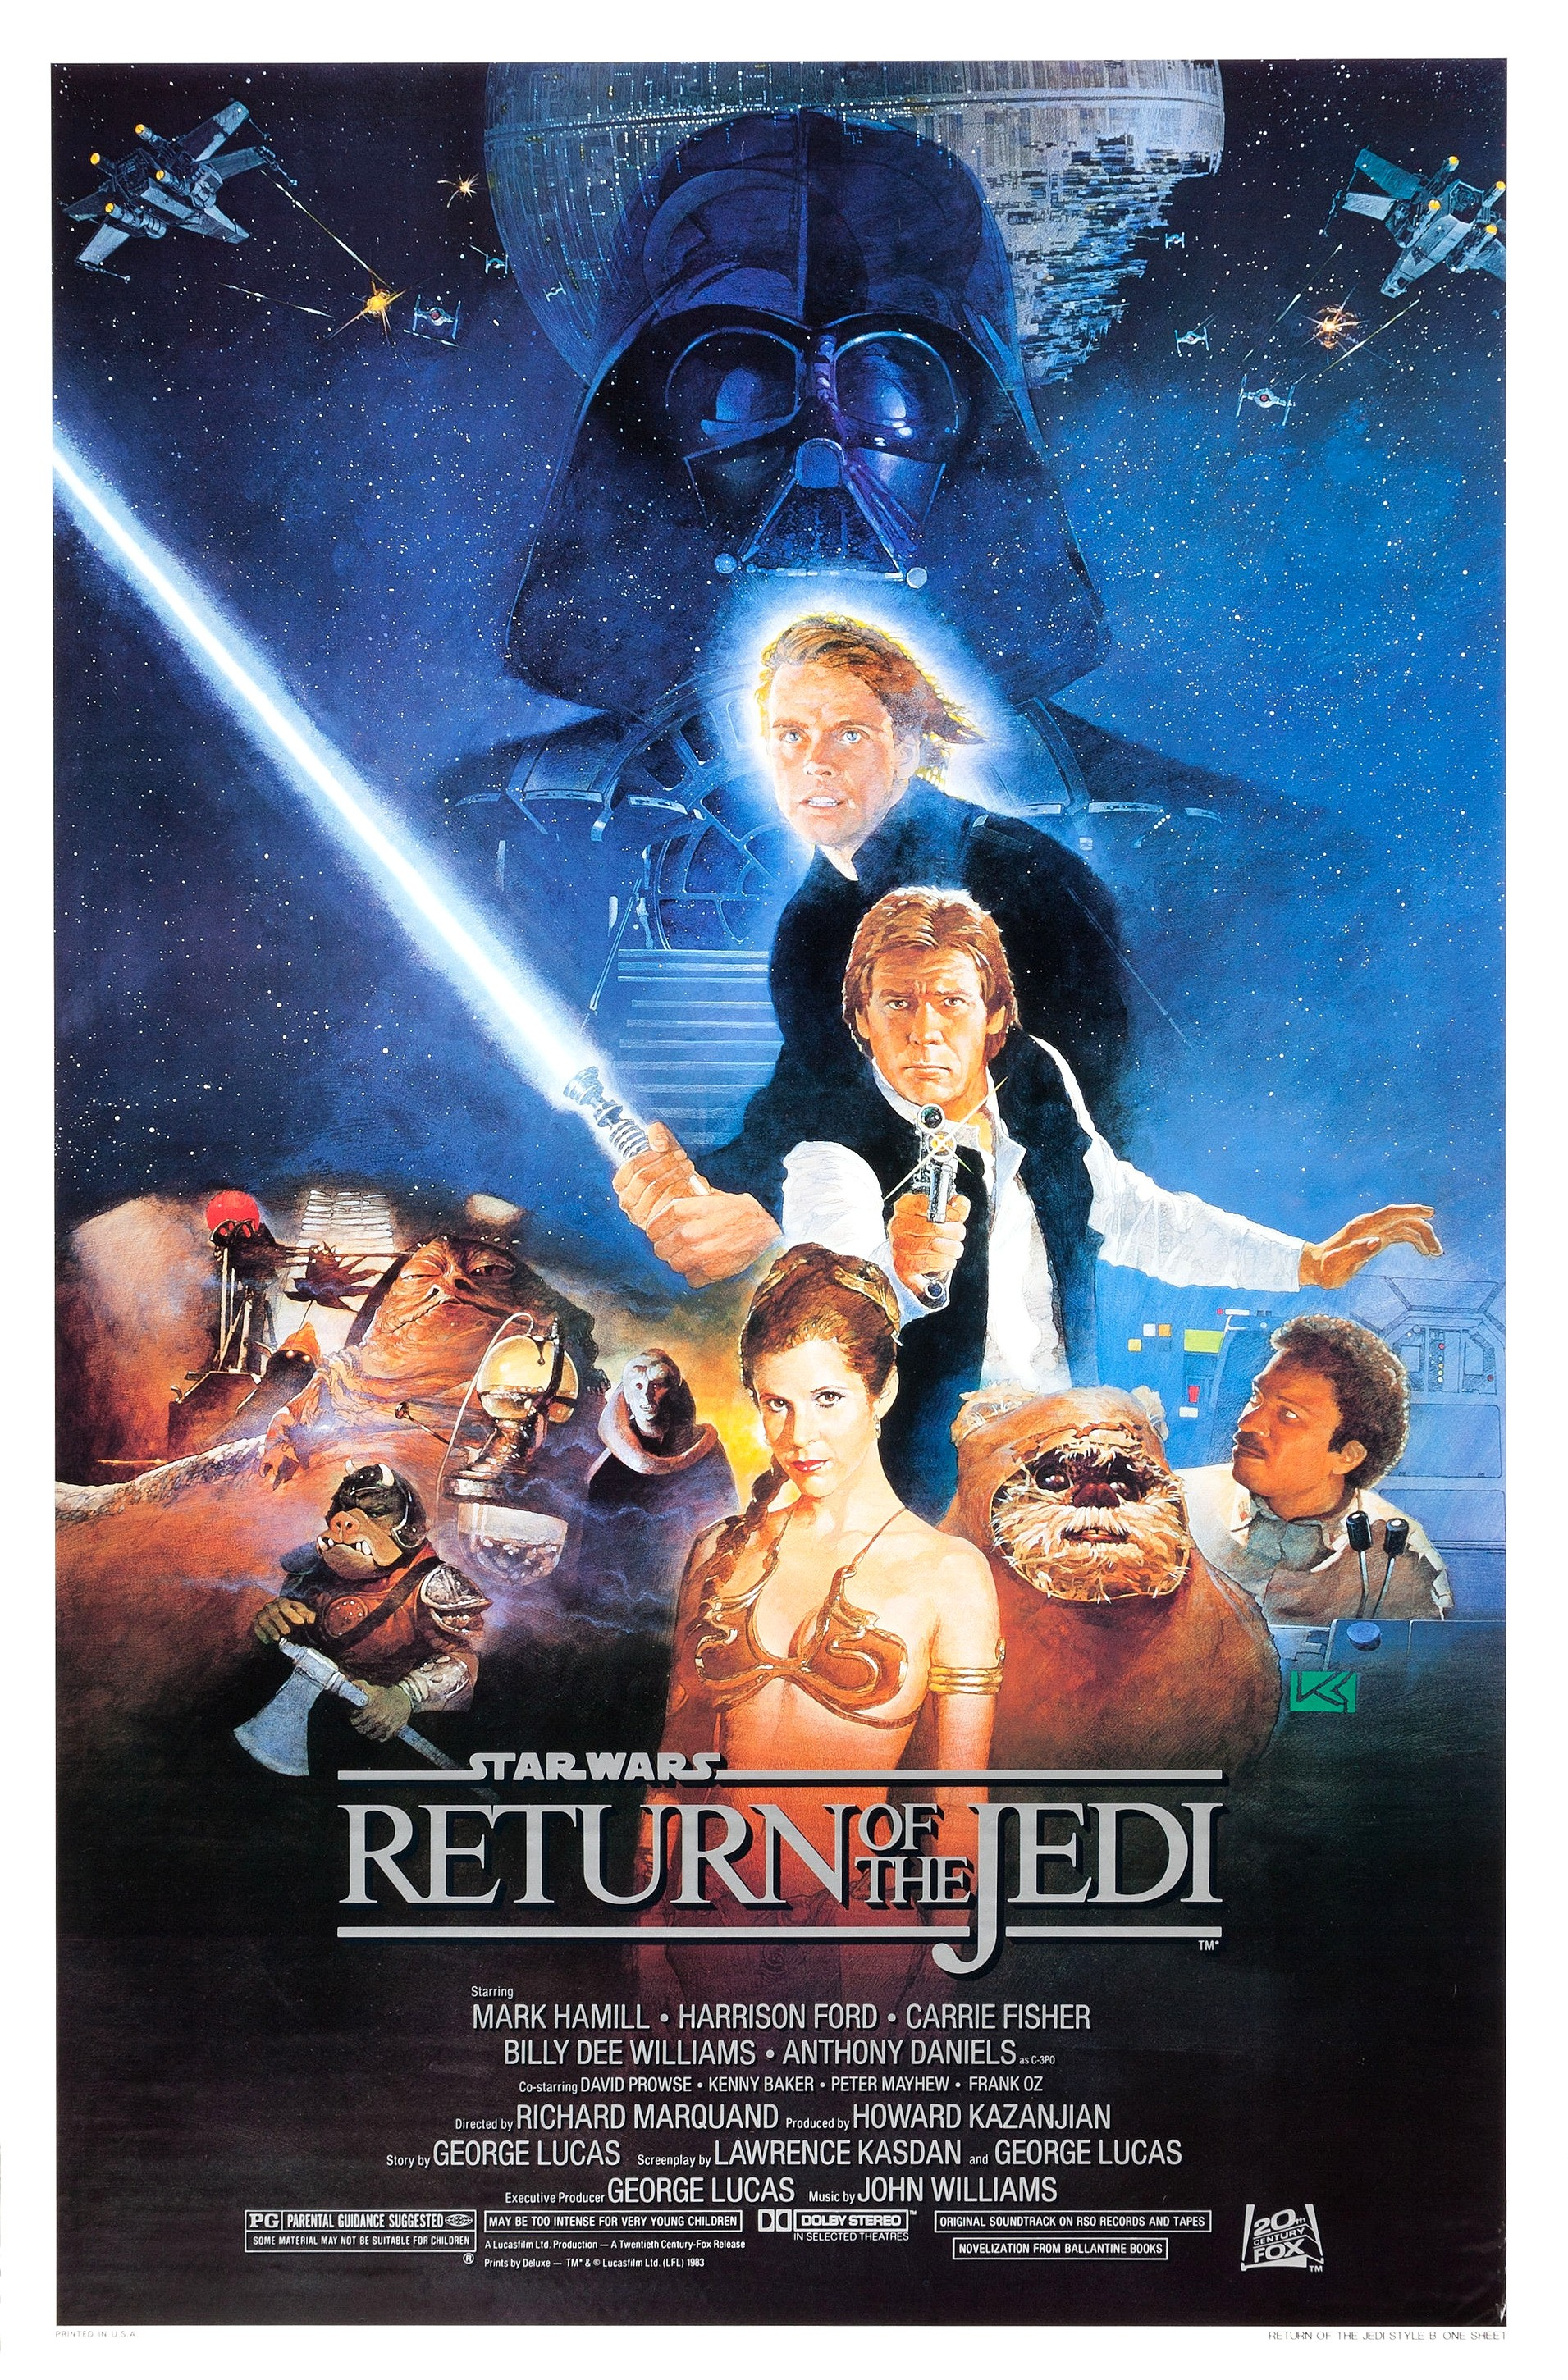 Star Wars Episode VI: Return of the Jedi (1983)